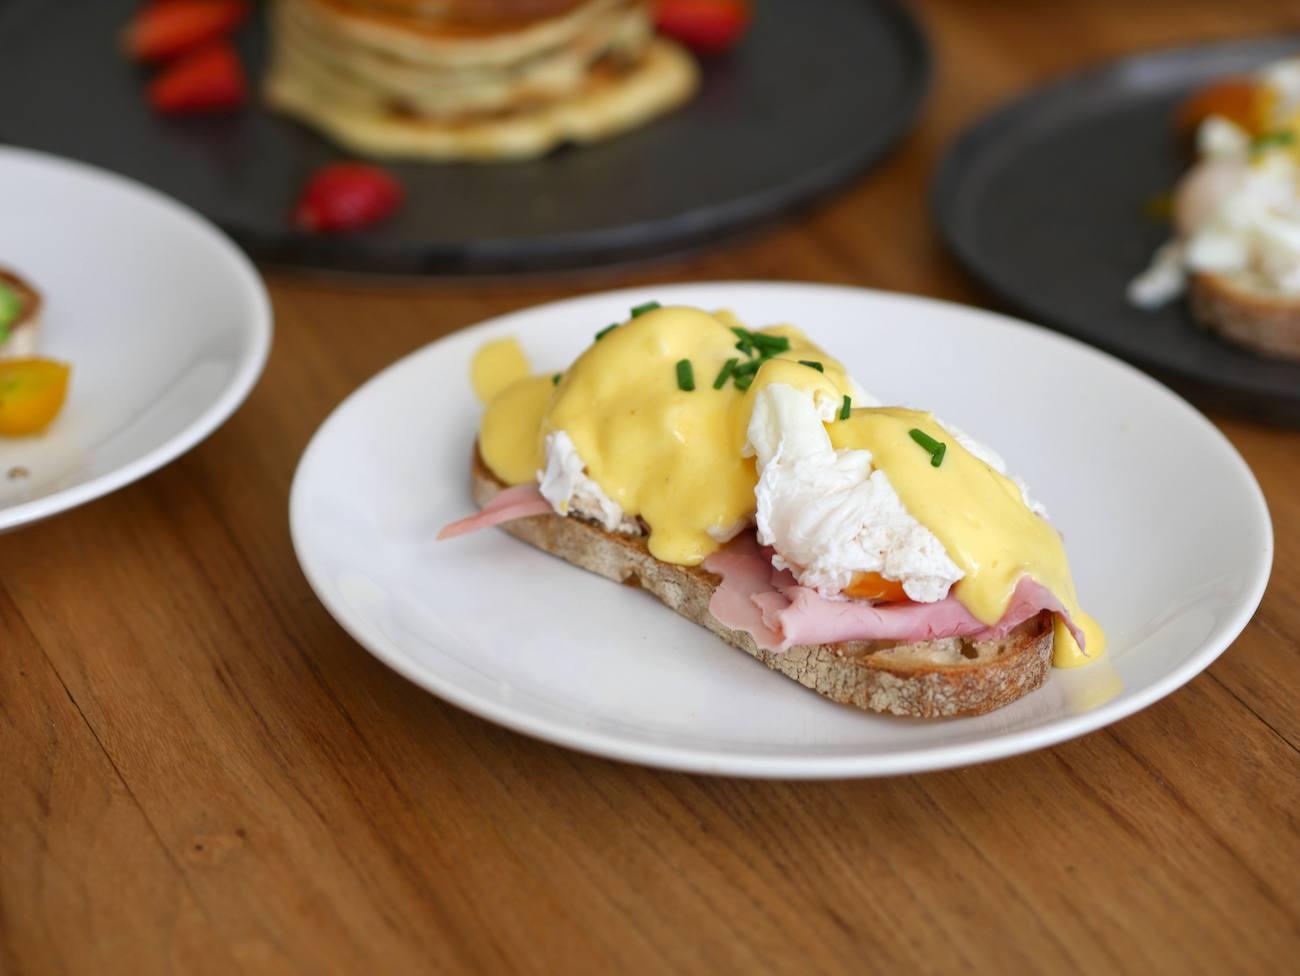 brunch-maison-recette-pancakes-toast-oeuf-benedicte-infuz-4